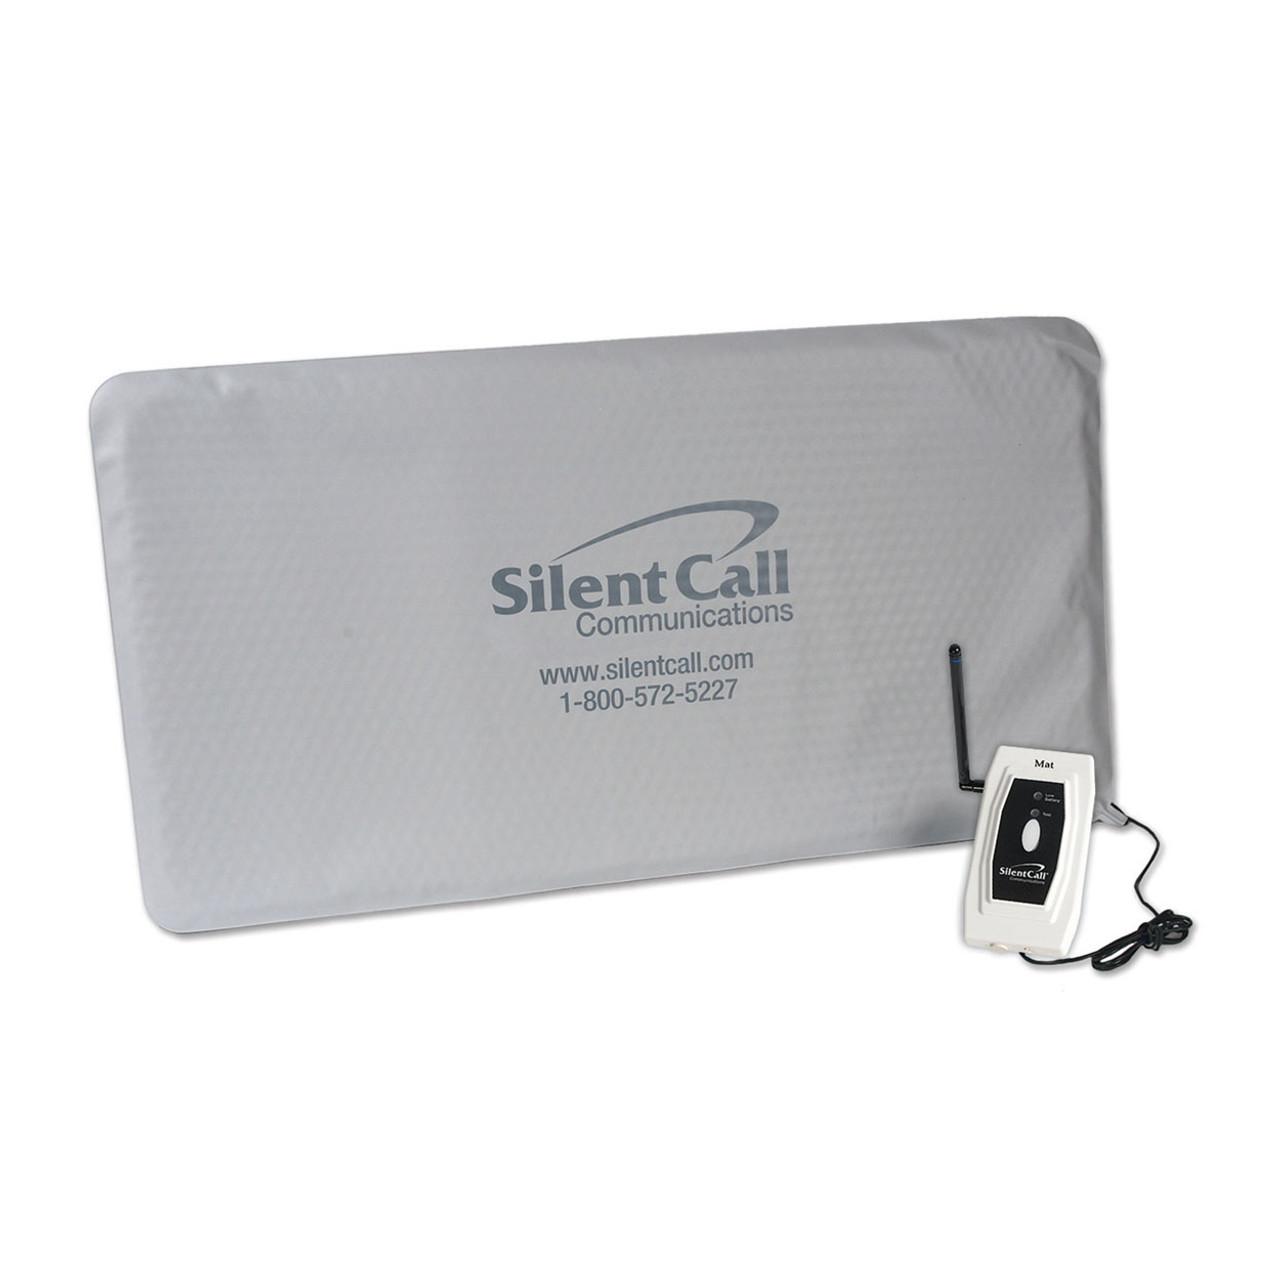 Silent Call Medallion Mat with Transmitter